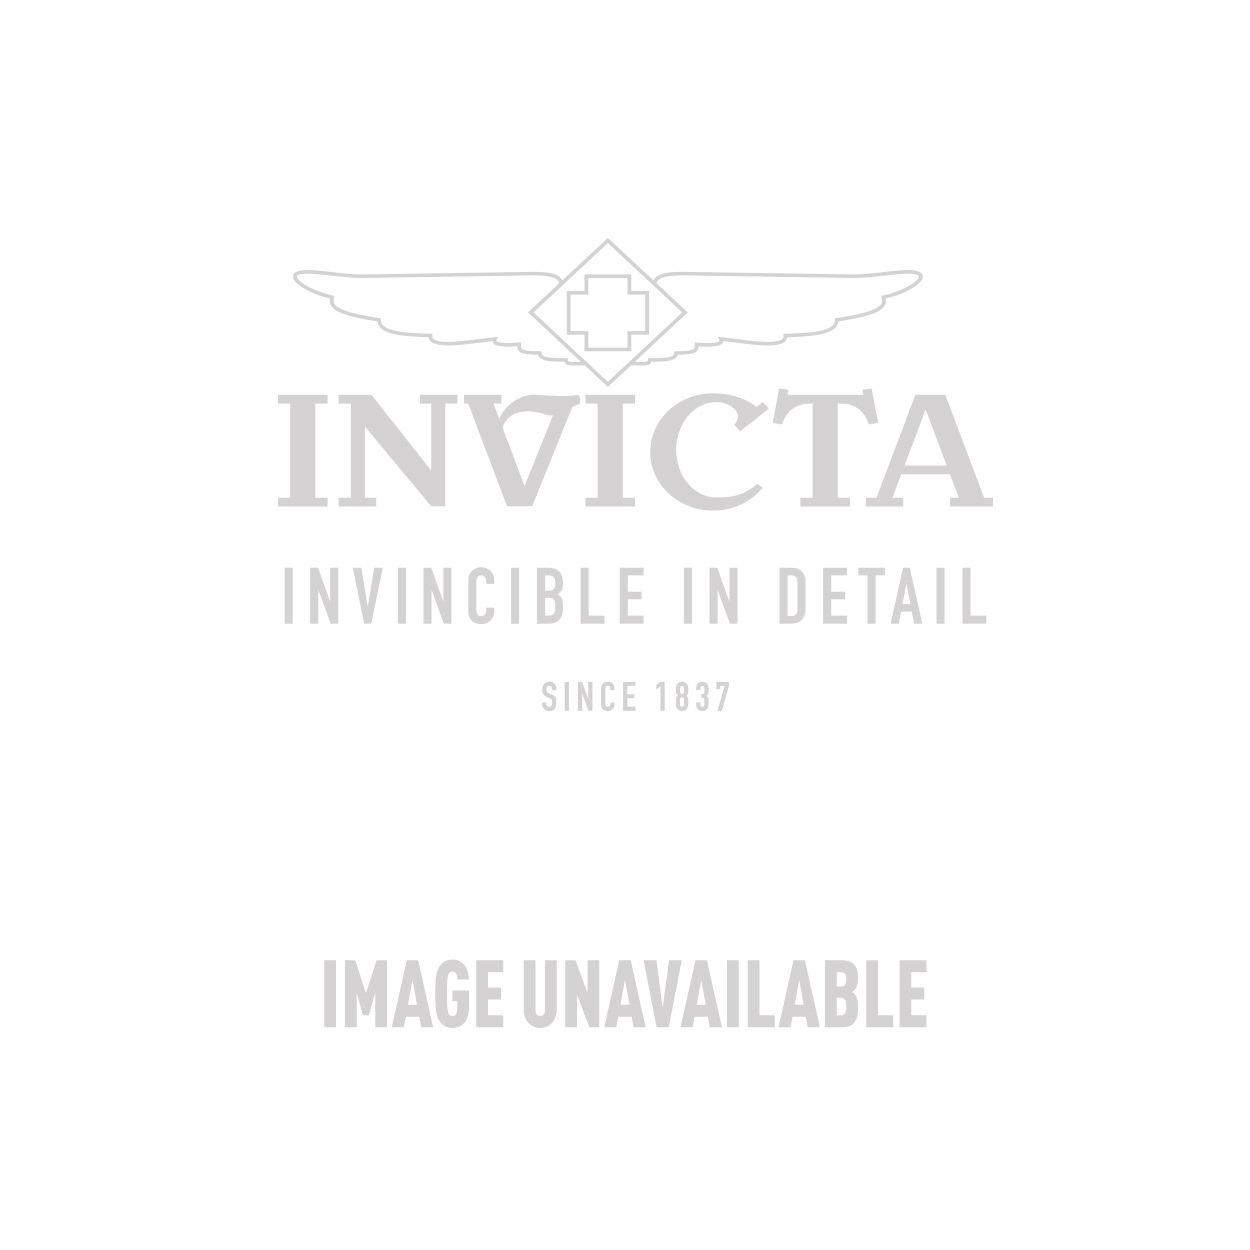 Invicta Corduba Swiss Movement Quartz Watch - Gold, Black case with Gold, Black tone Stainless Steel, Polyurethane band - Model 19235